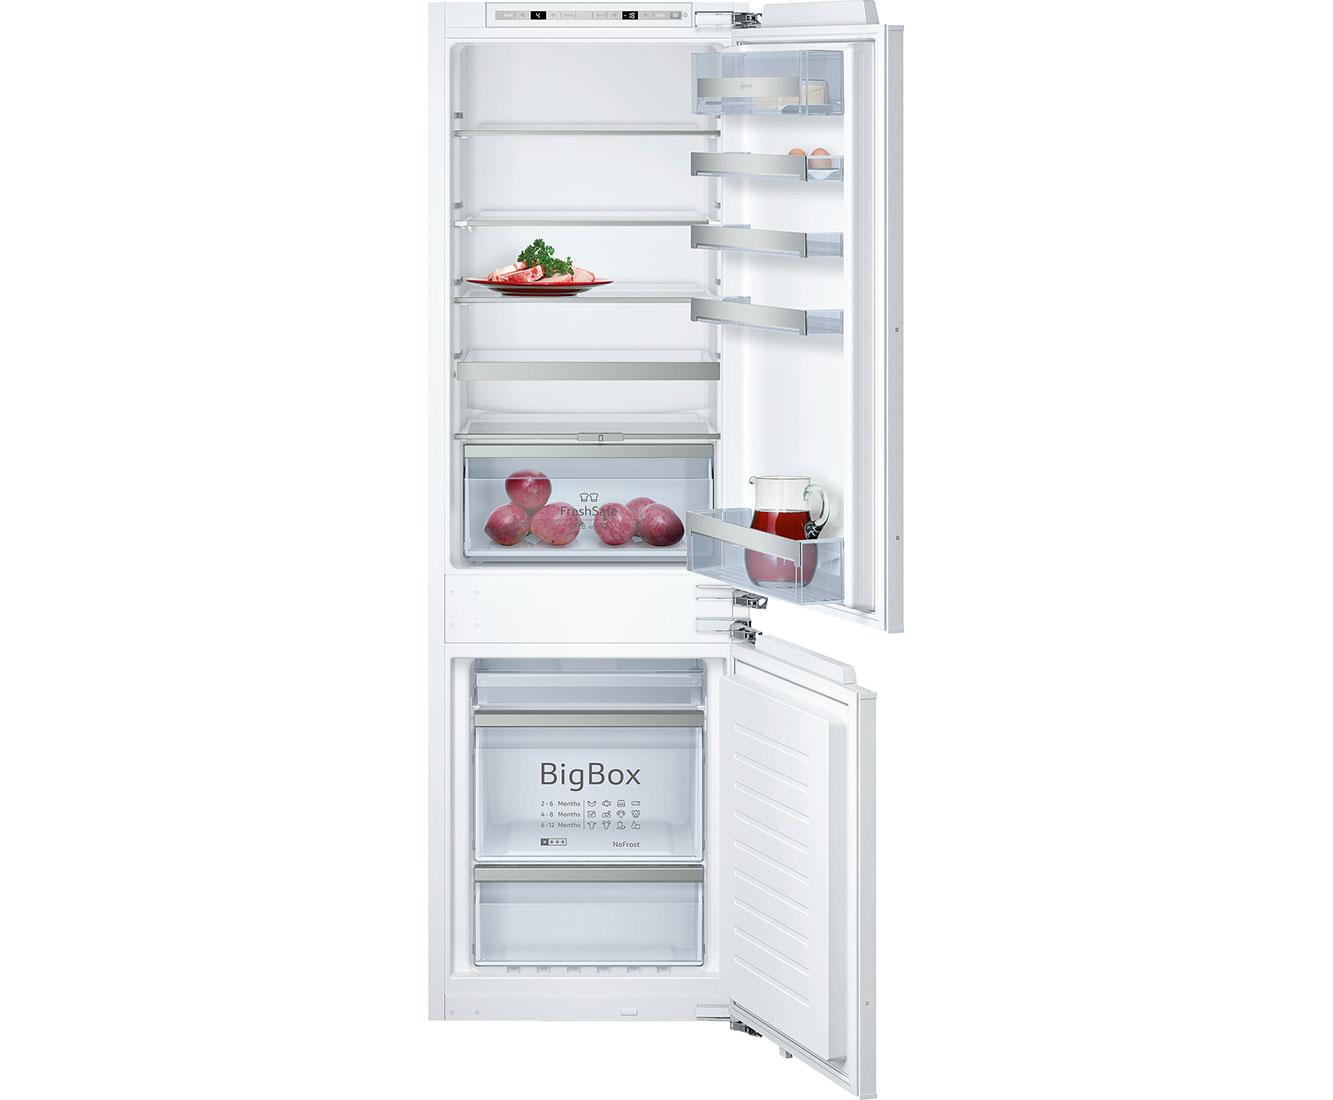 Aeg Kühlschrank Rtb91531aw : Rabatt preisvergleich.de essen elektrogeräte kühlen